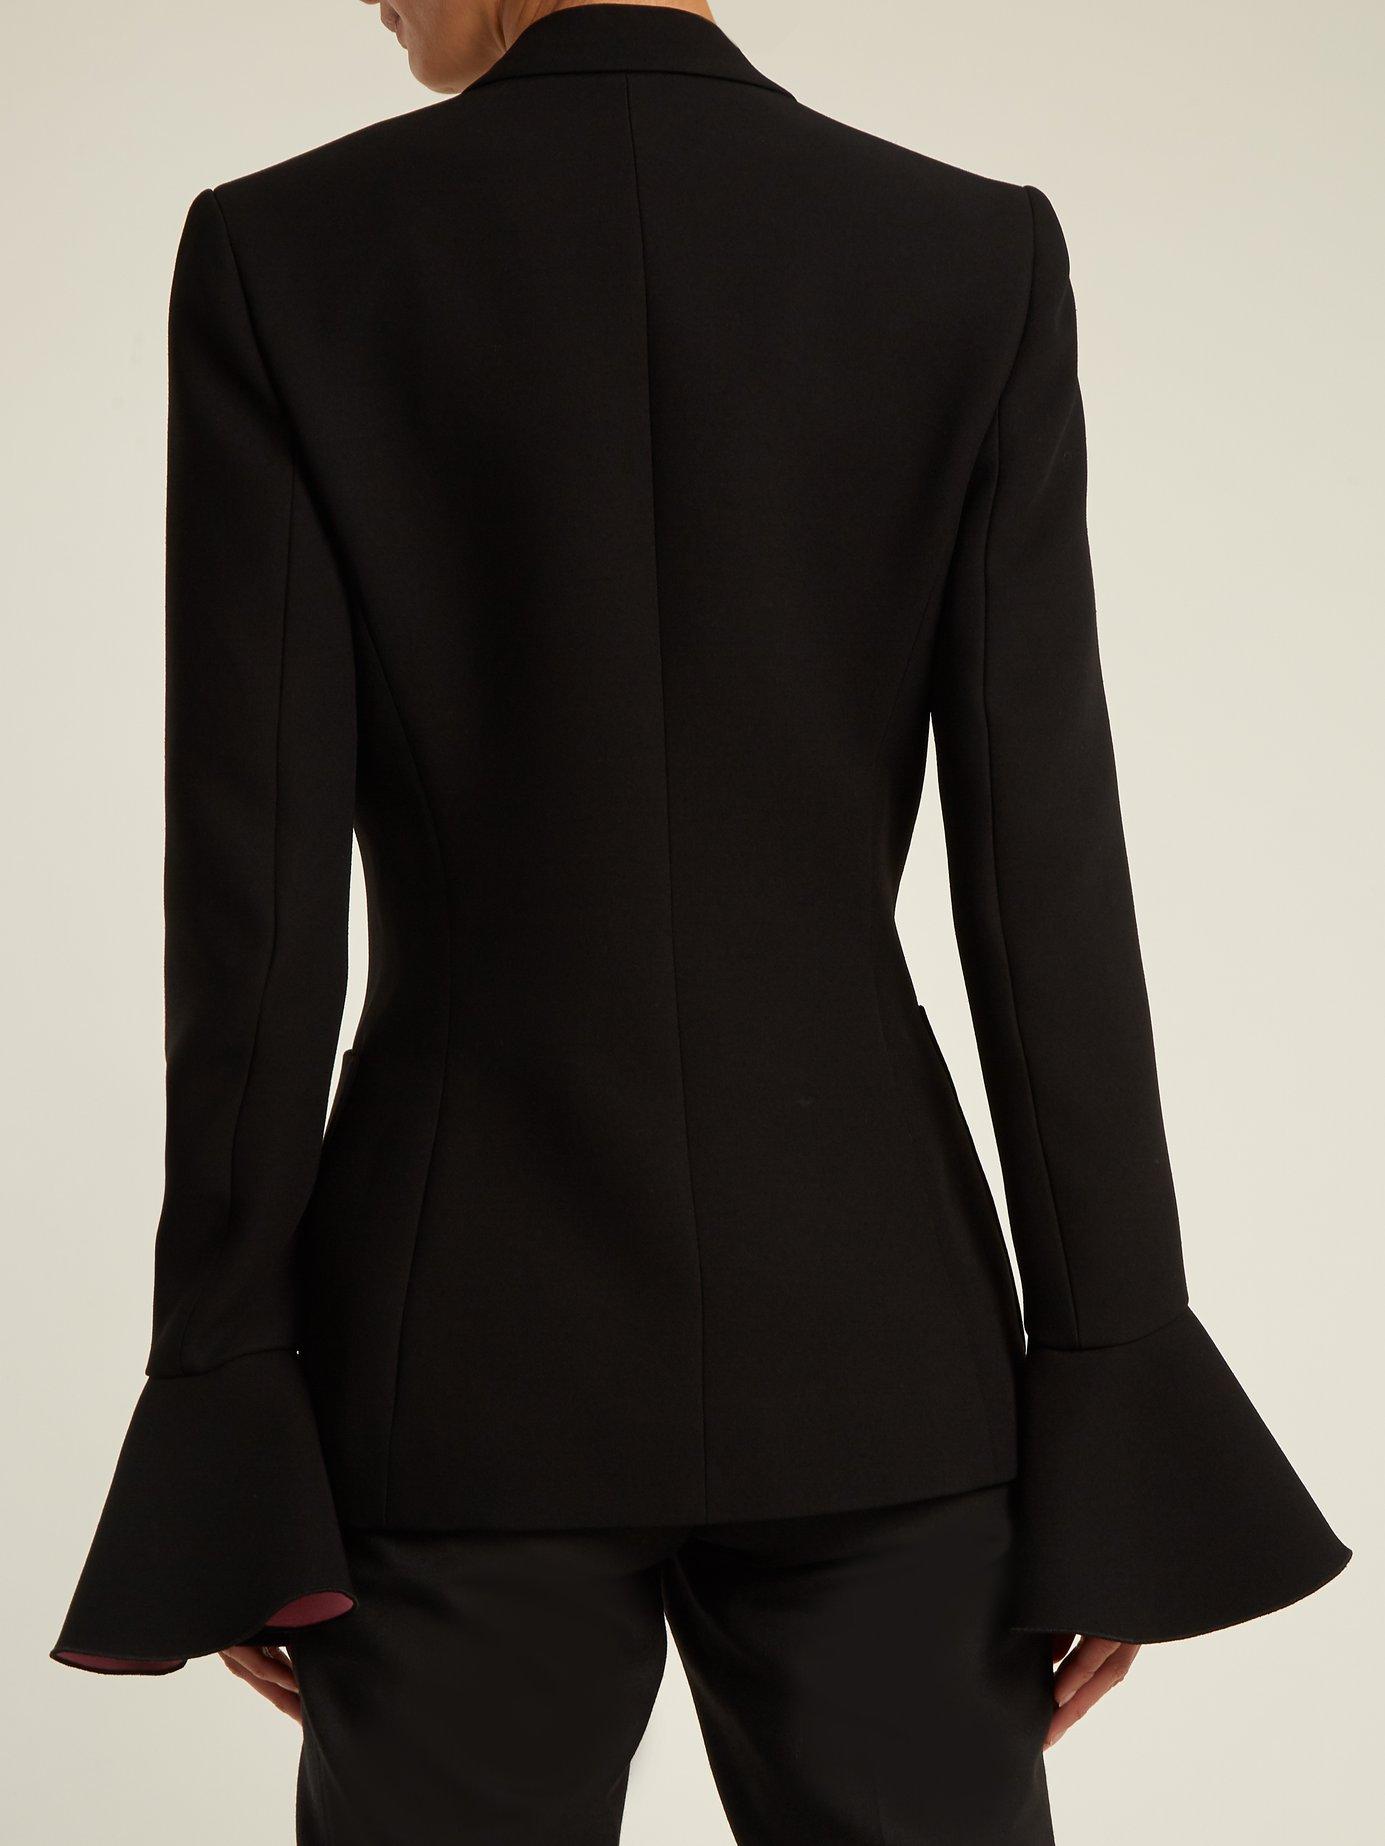 Riva bell-sleeved crepe blazer by Roksanda